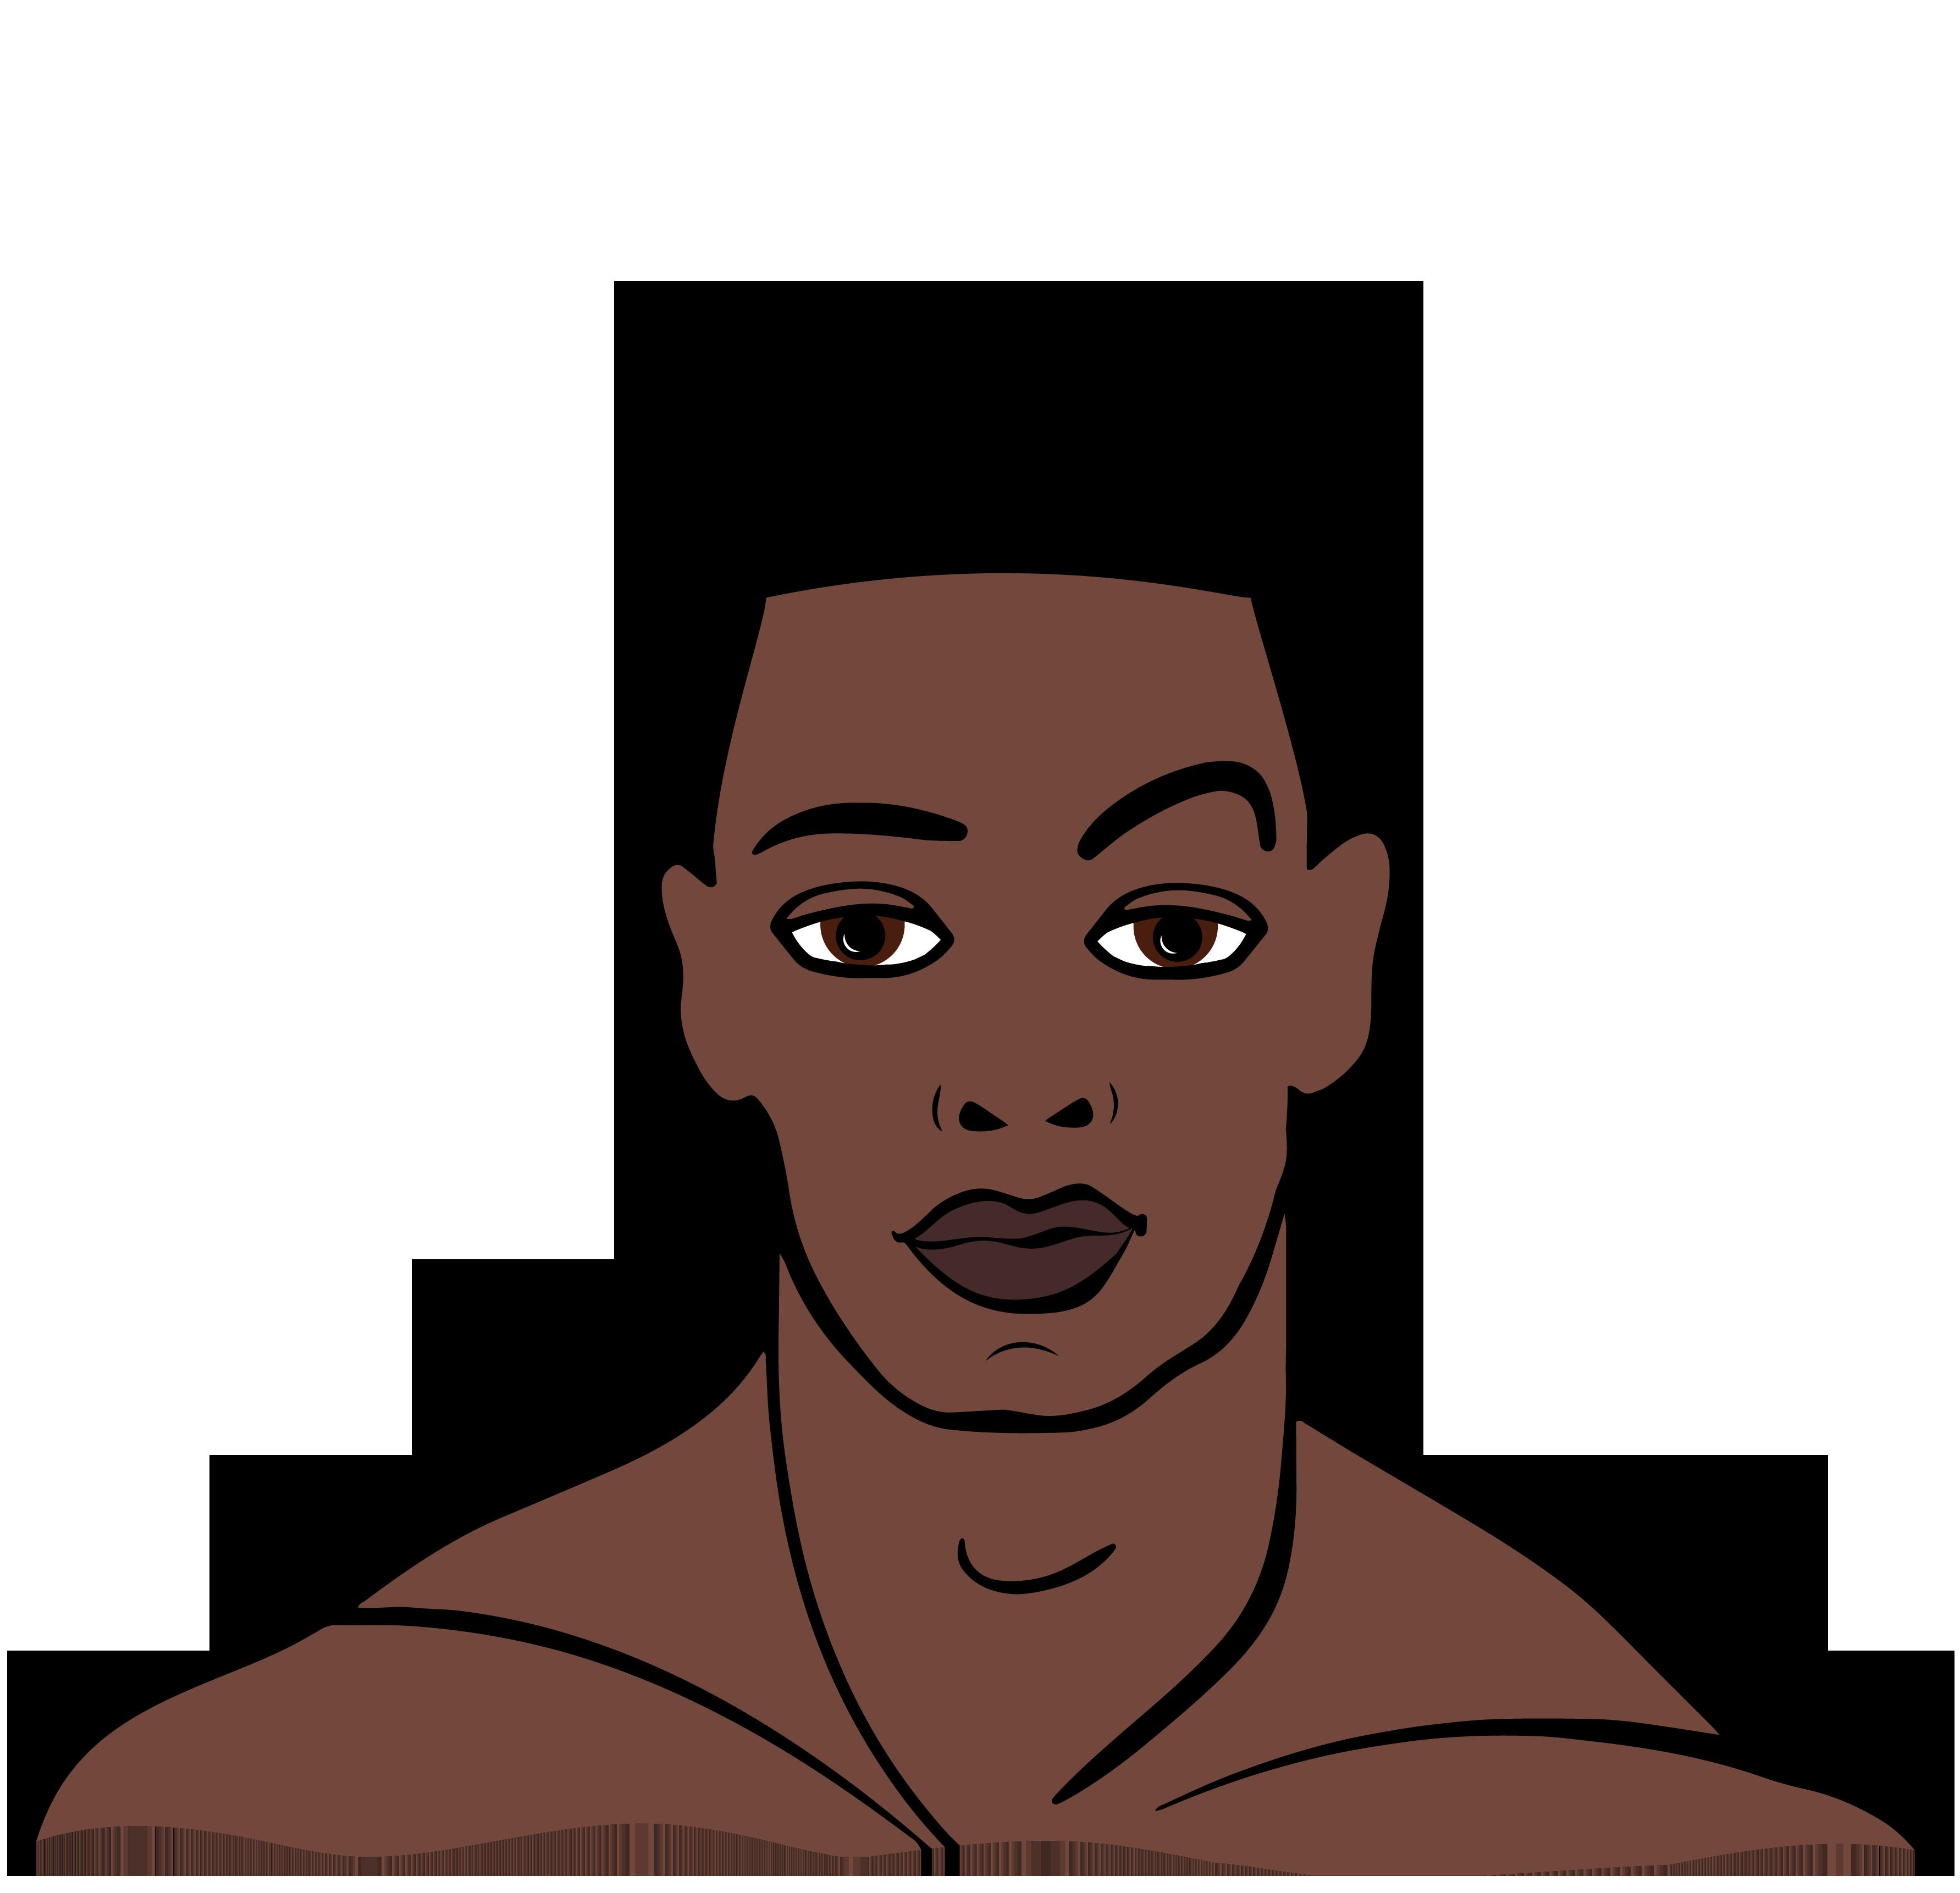 DIDIKO designs Black Man SVG